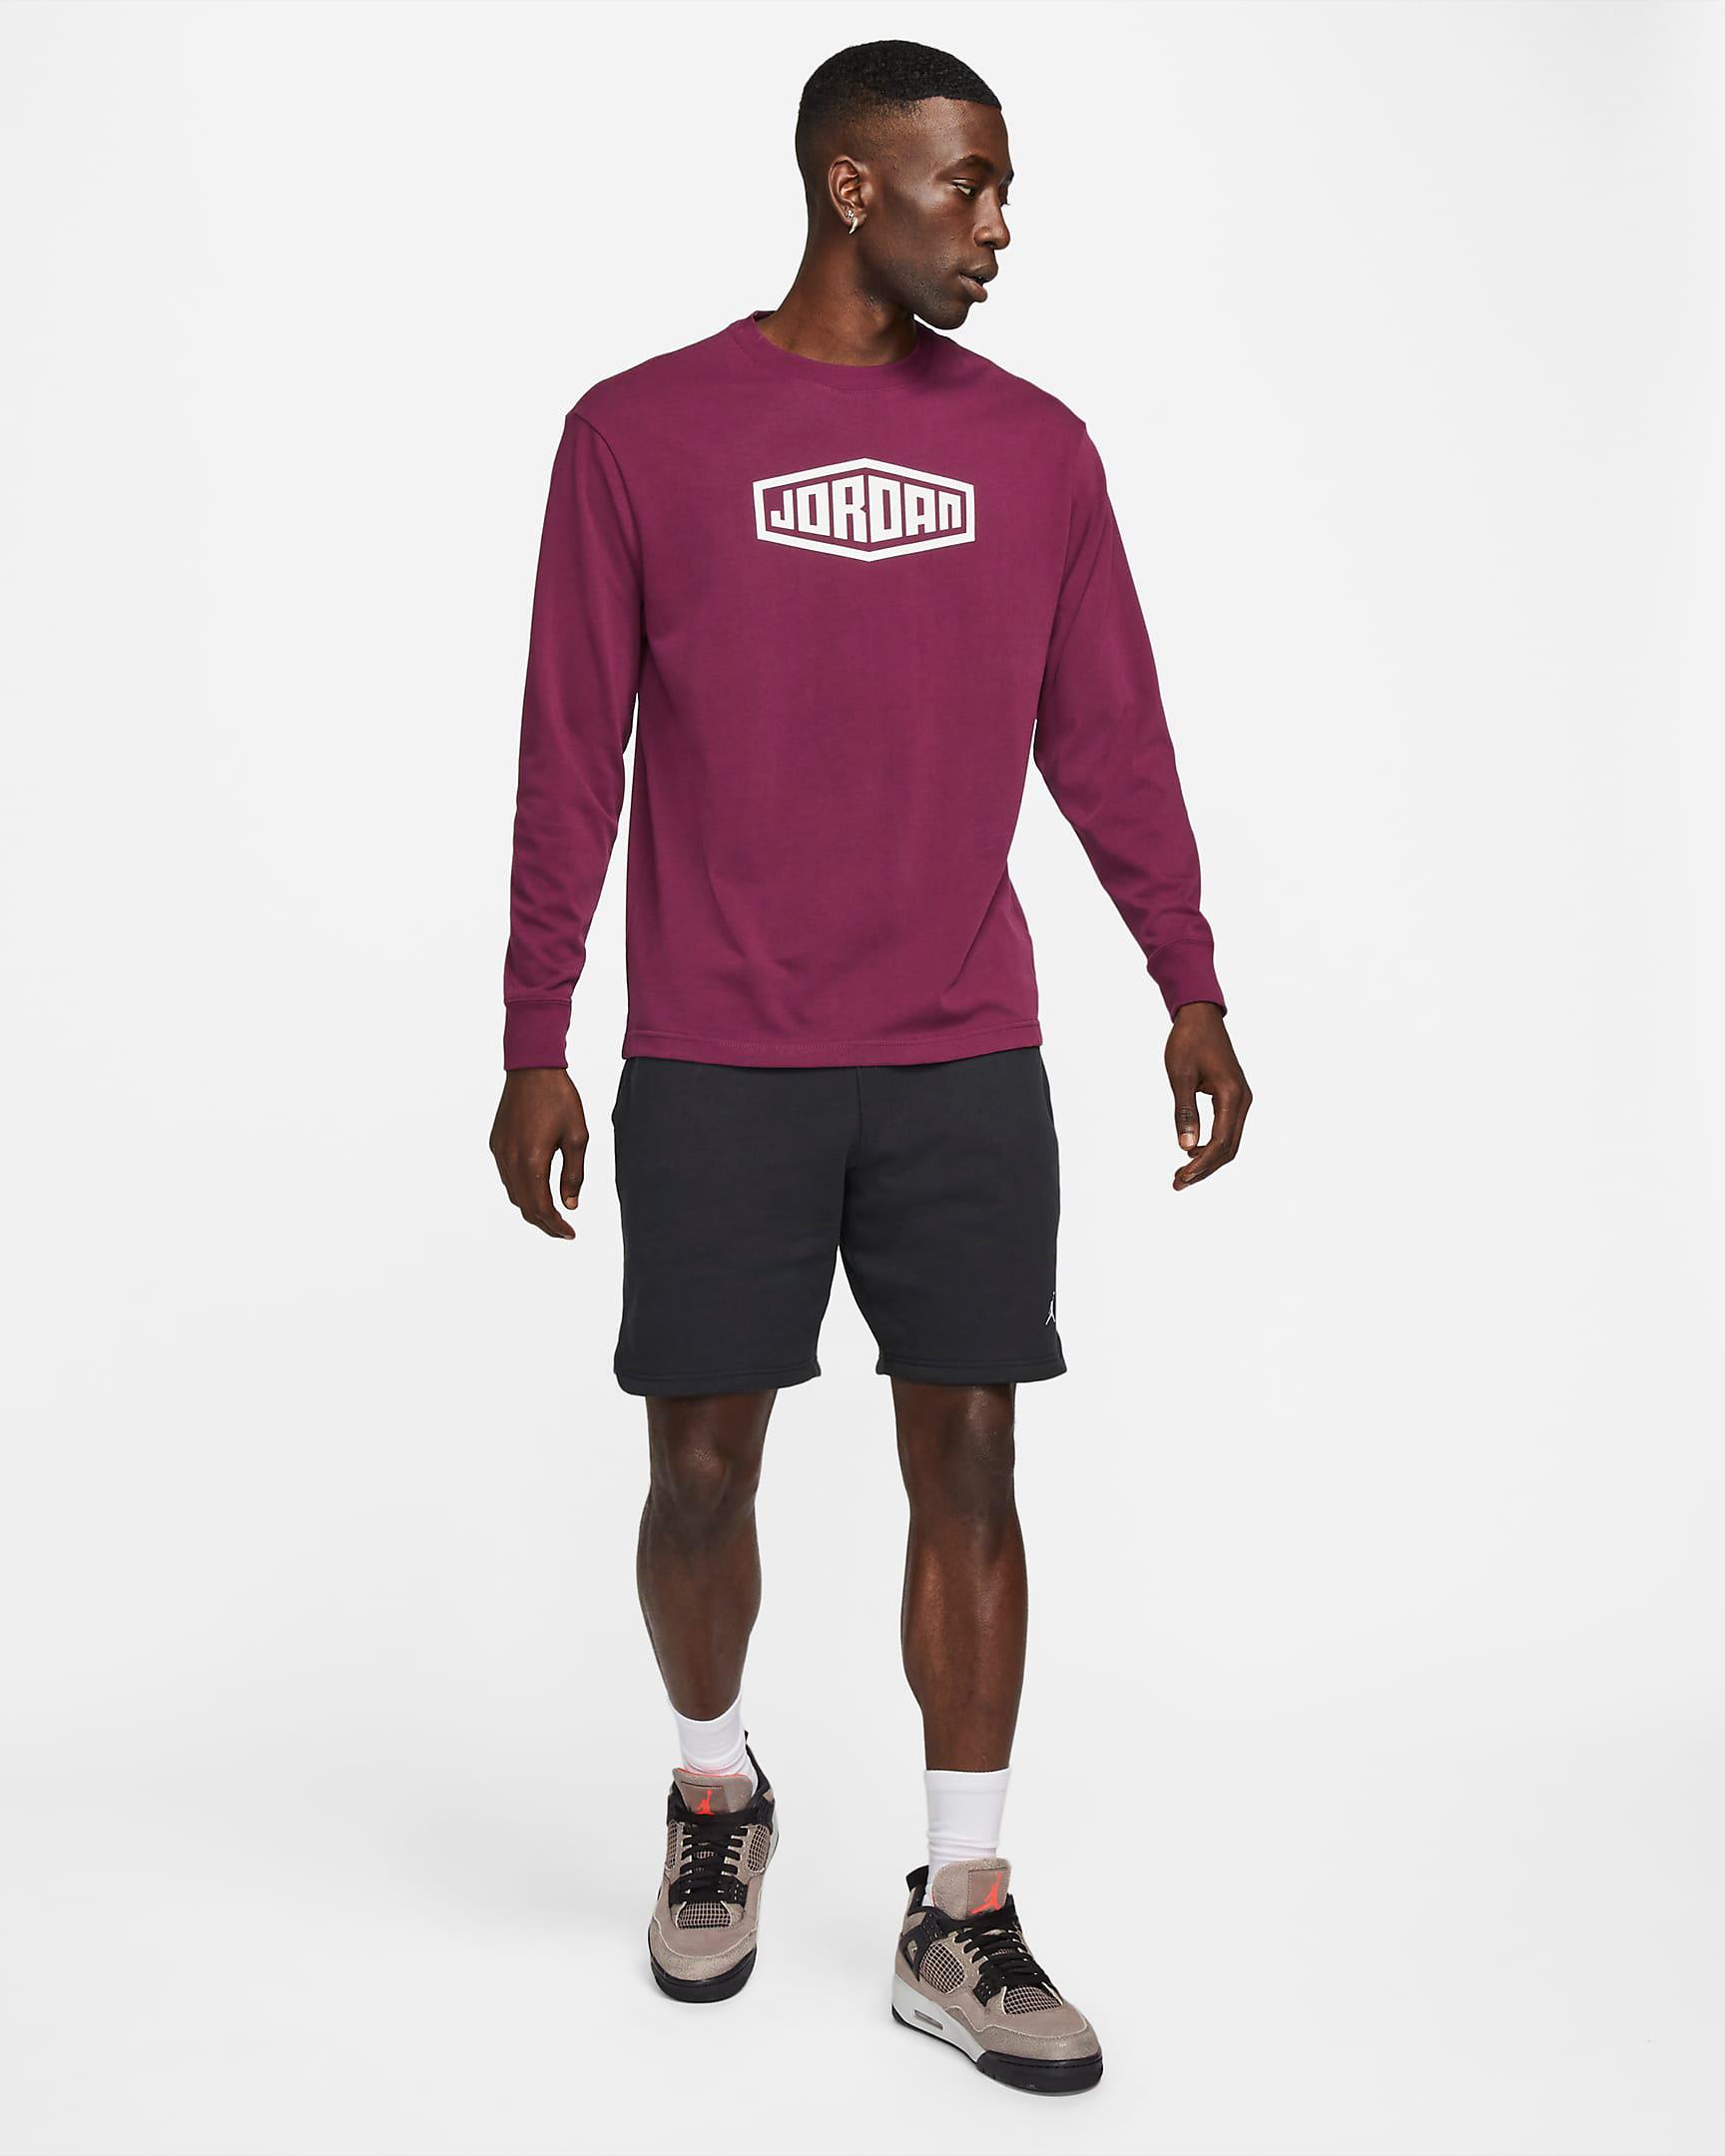 jordan-bordeaux-sport-dna-long-sleeve-shirt-outfit